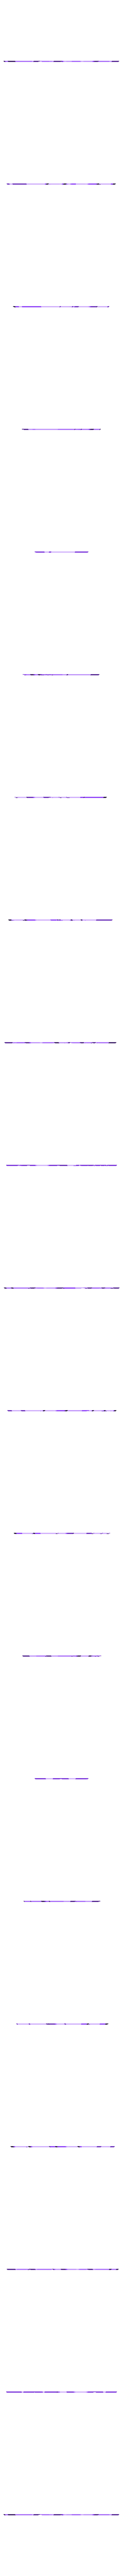 06-back.STL Download STL file AC/DC led lamp #3dprintRocks • 3D printing model, irunea3dprint